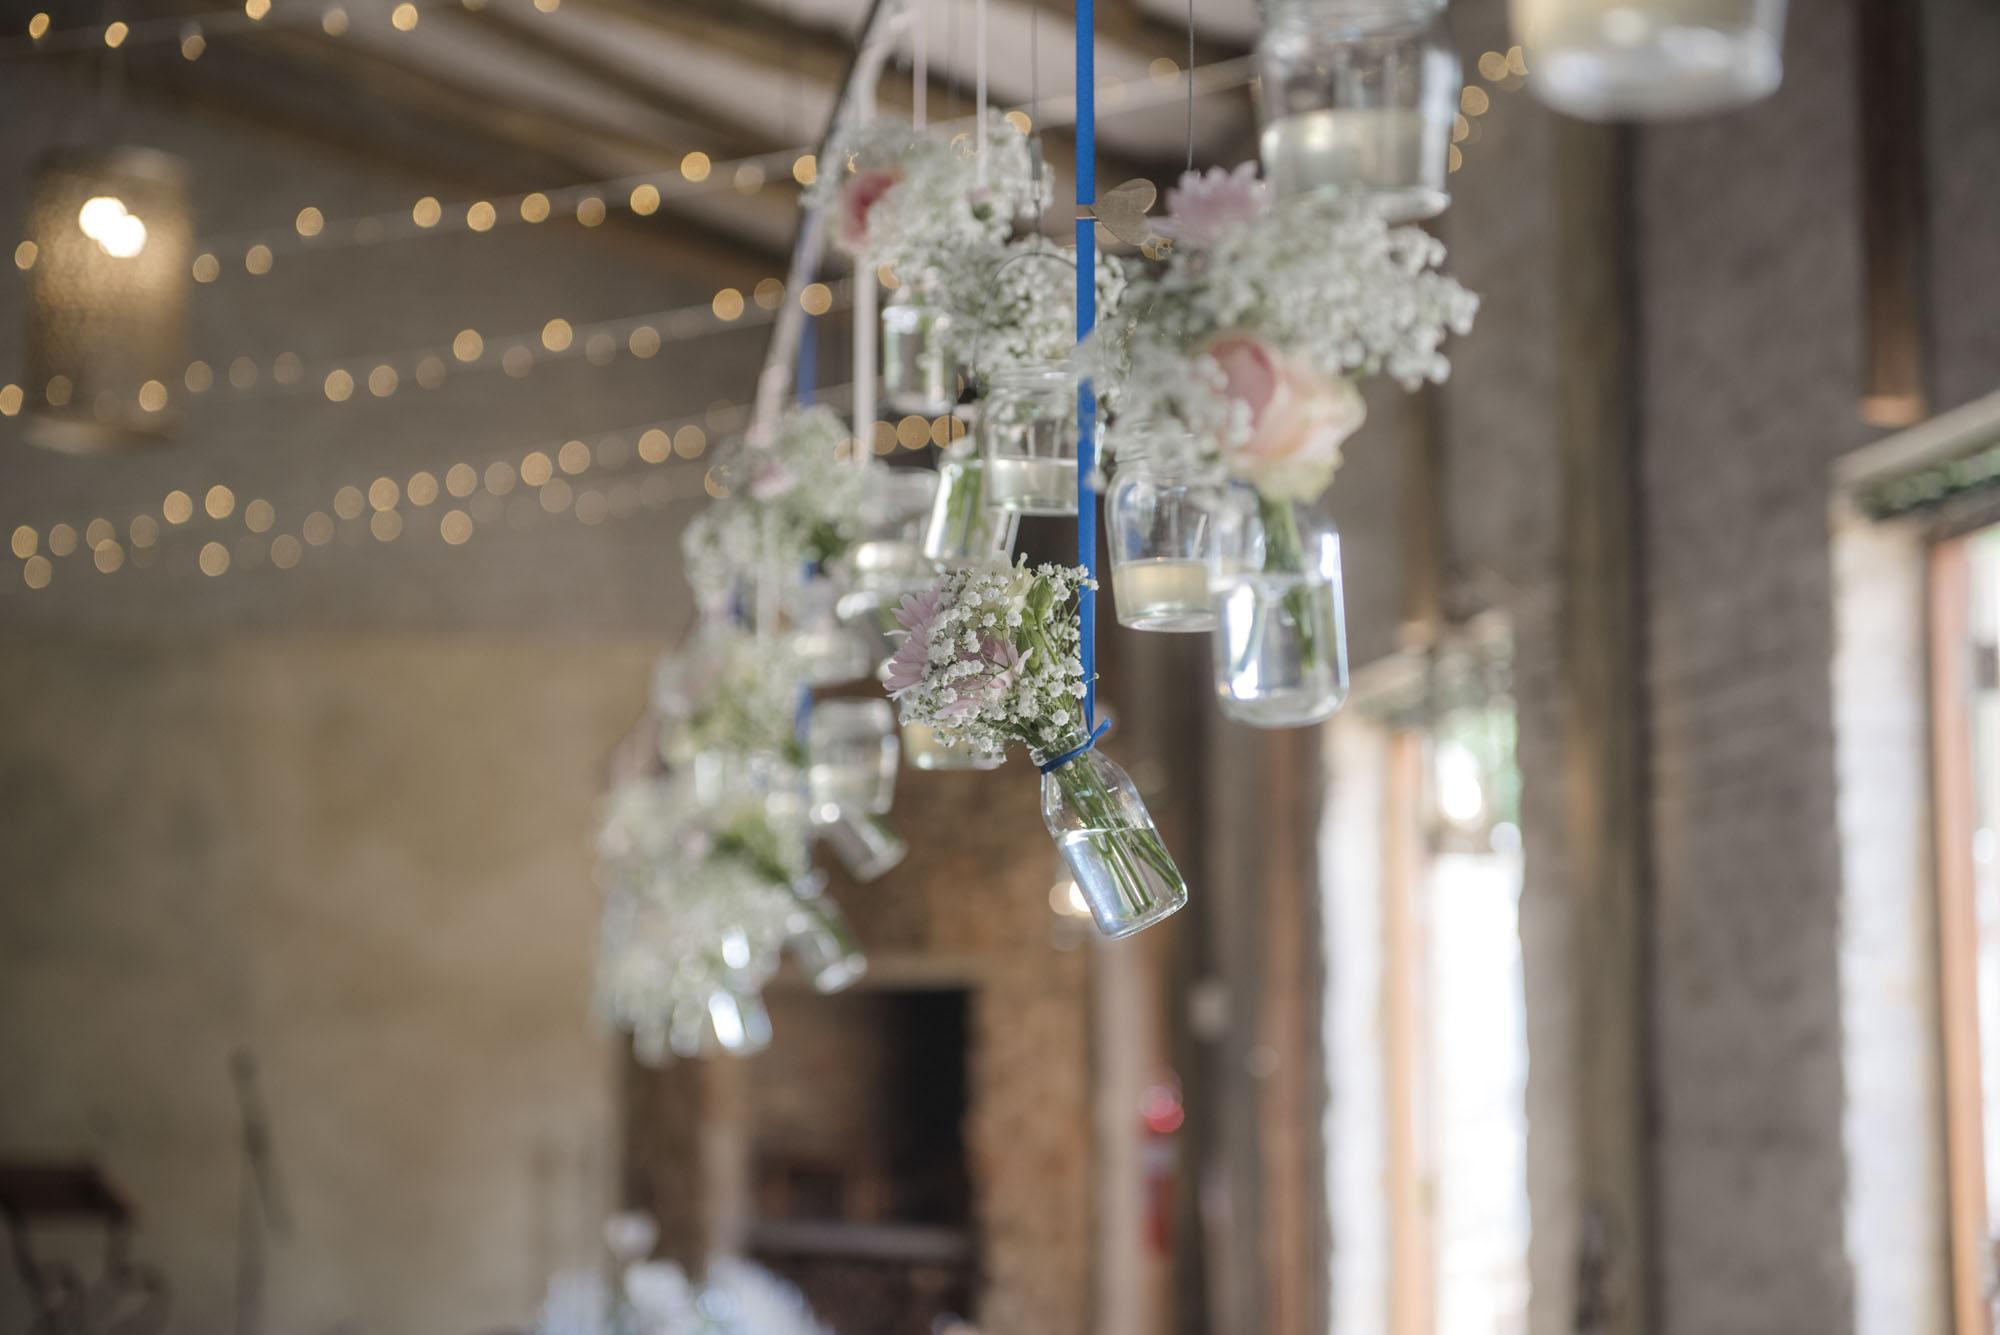 001aa-johannesburg-wedding-photographers.-johannesburg-wedding-photographers001aa-johannesburg-wedding-photographers.jpg